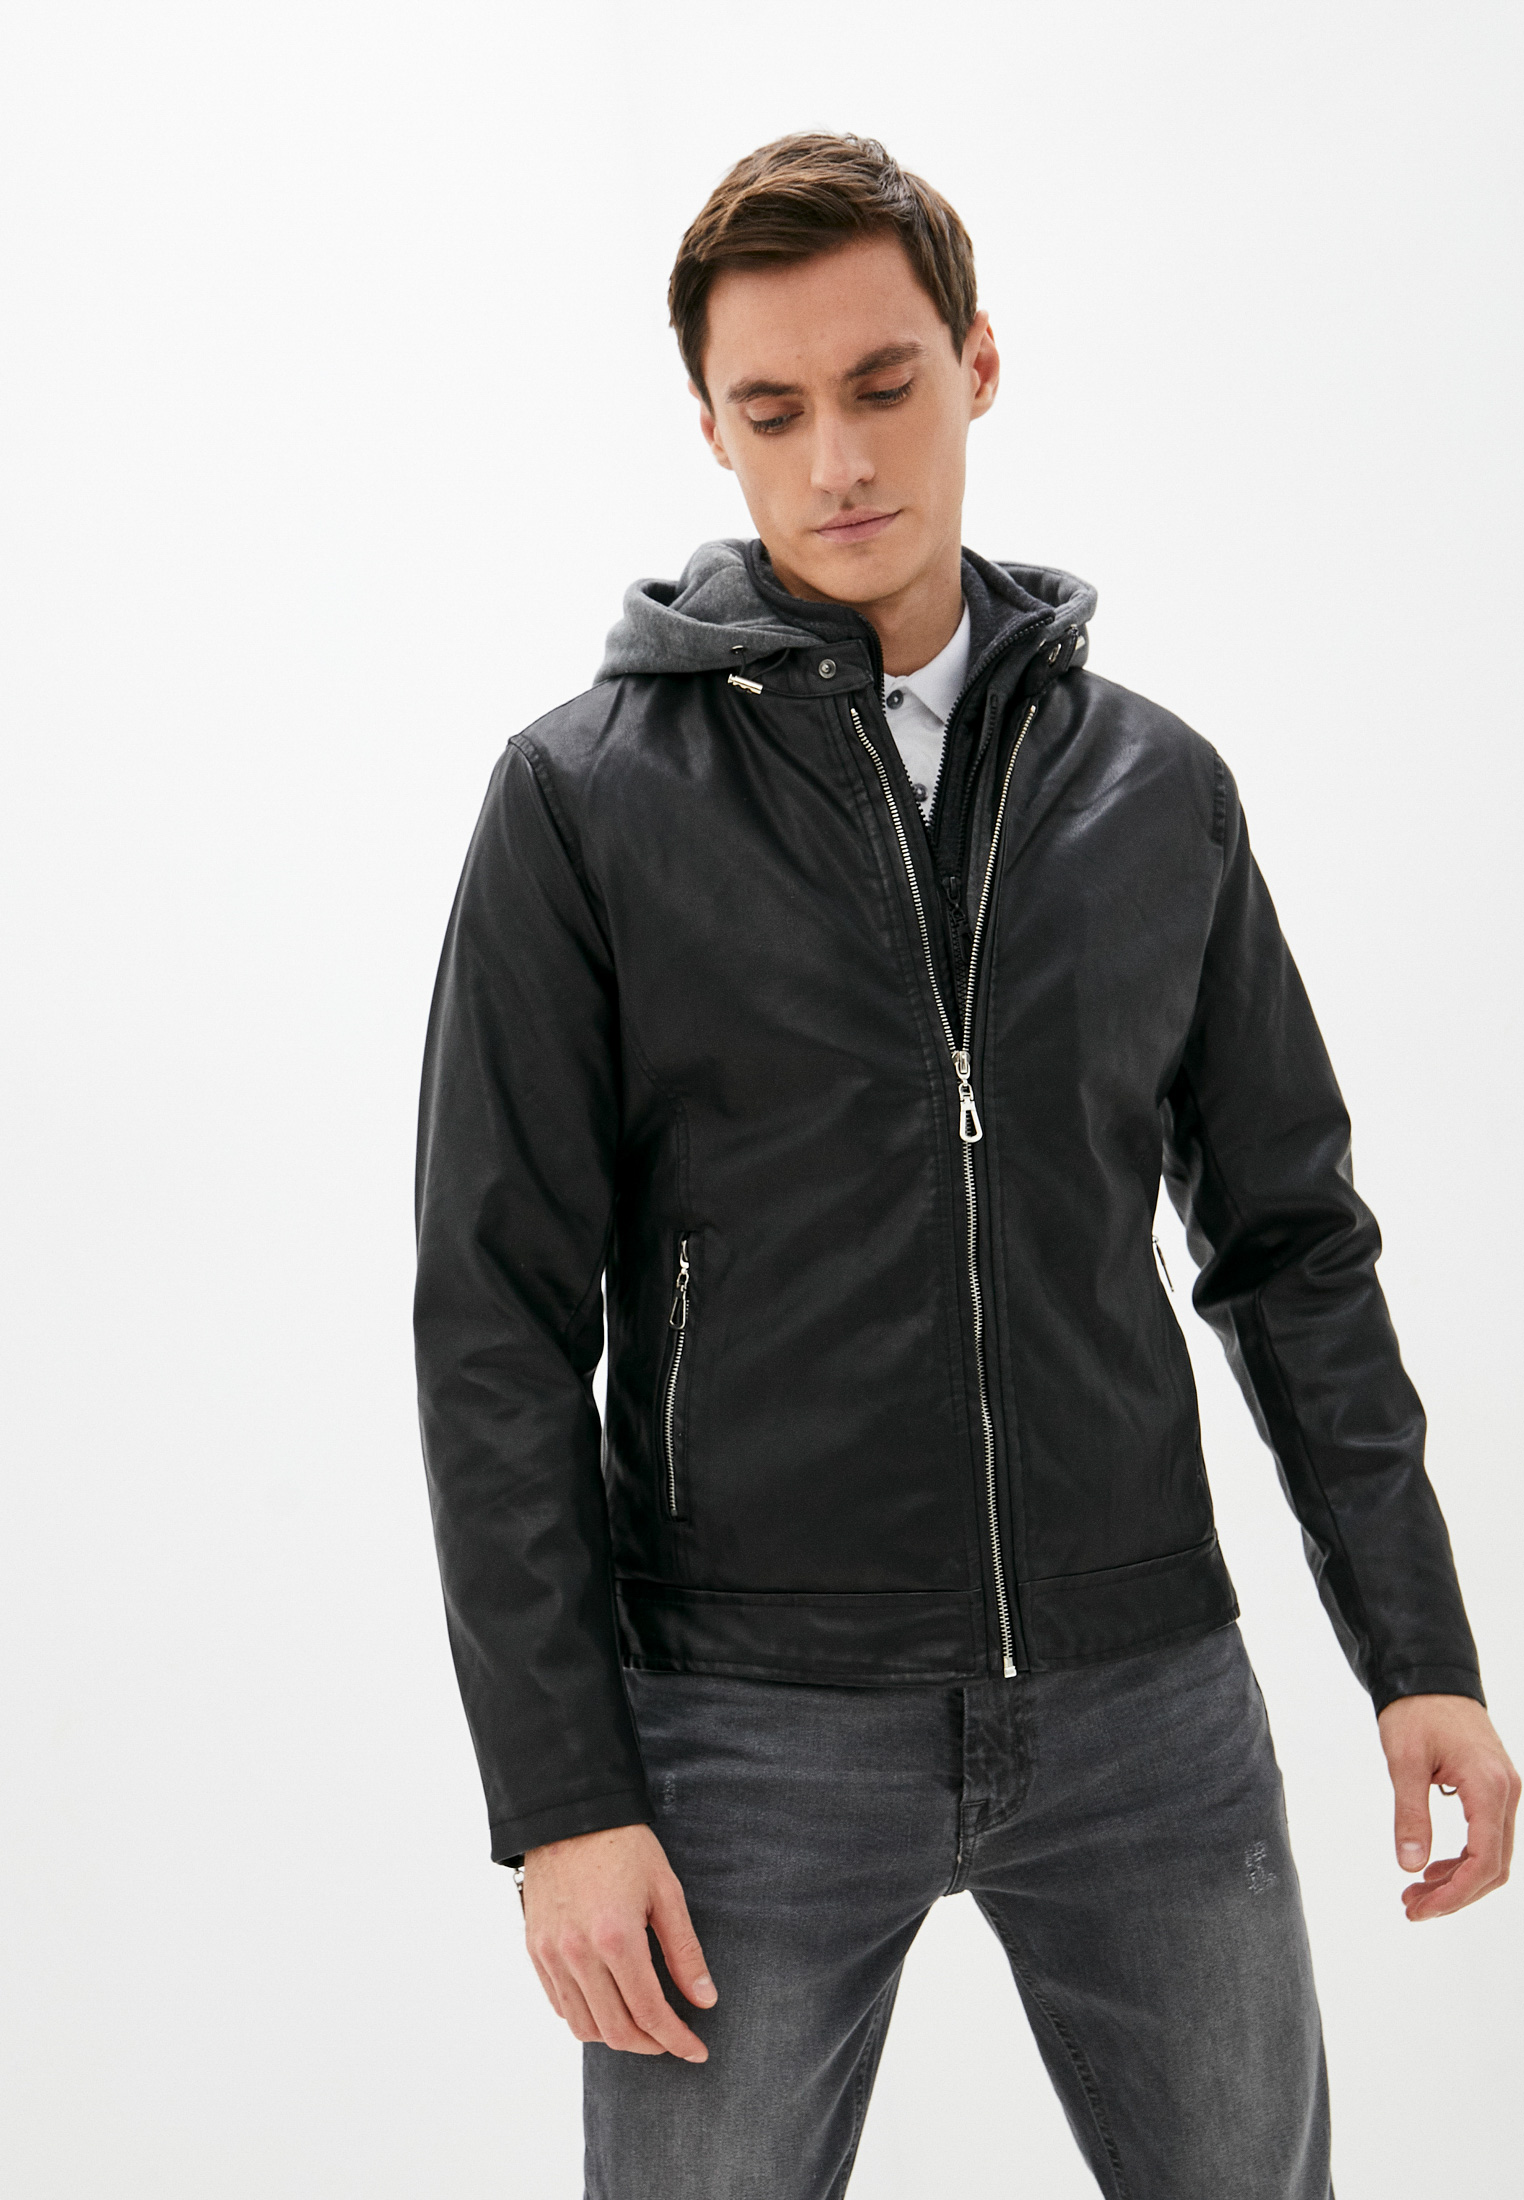 Кожаная куртка Tony Backer (Тони Беккер) Куртка кожаная Tony Backer